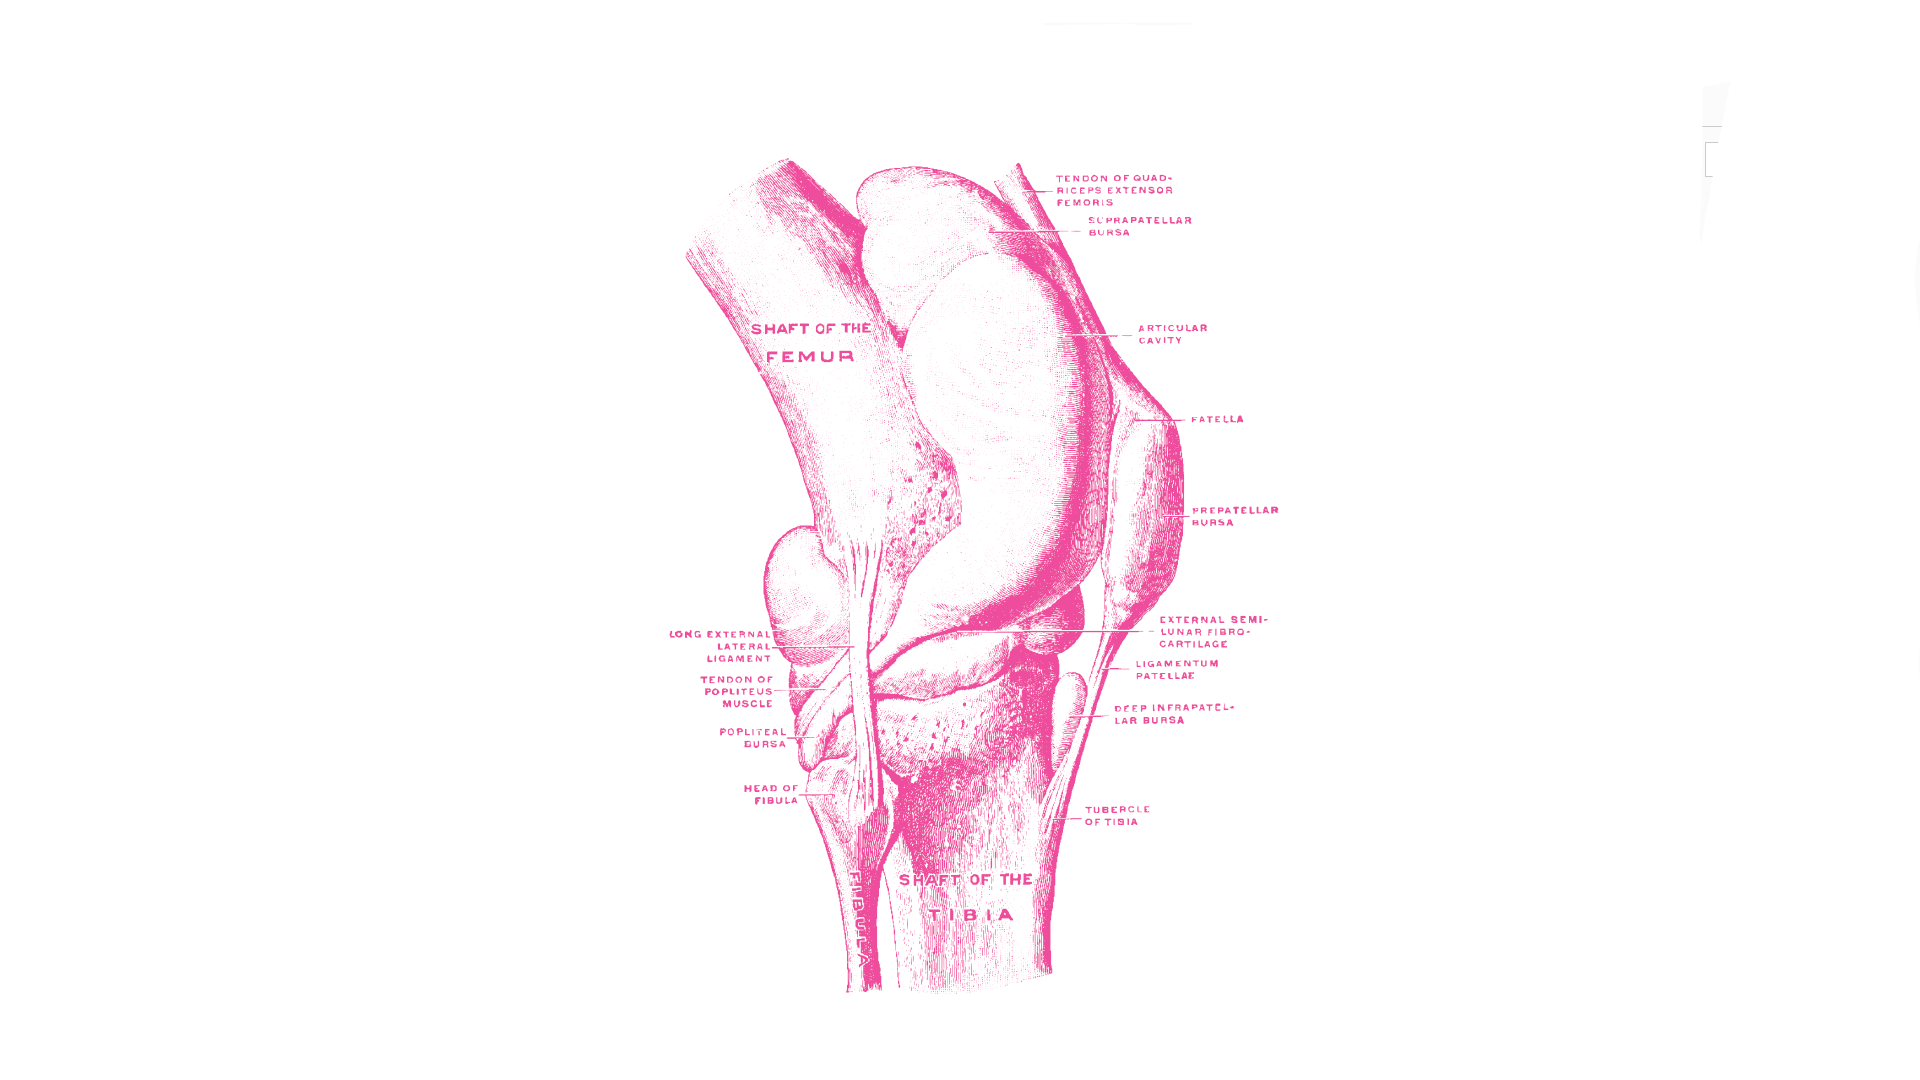 Line drawing of human knee anatomy